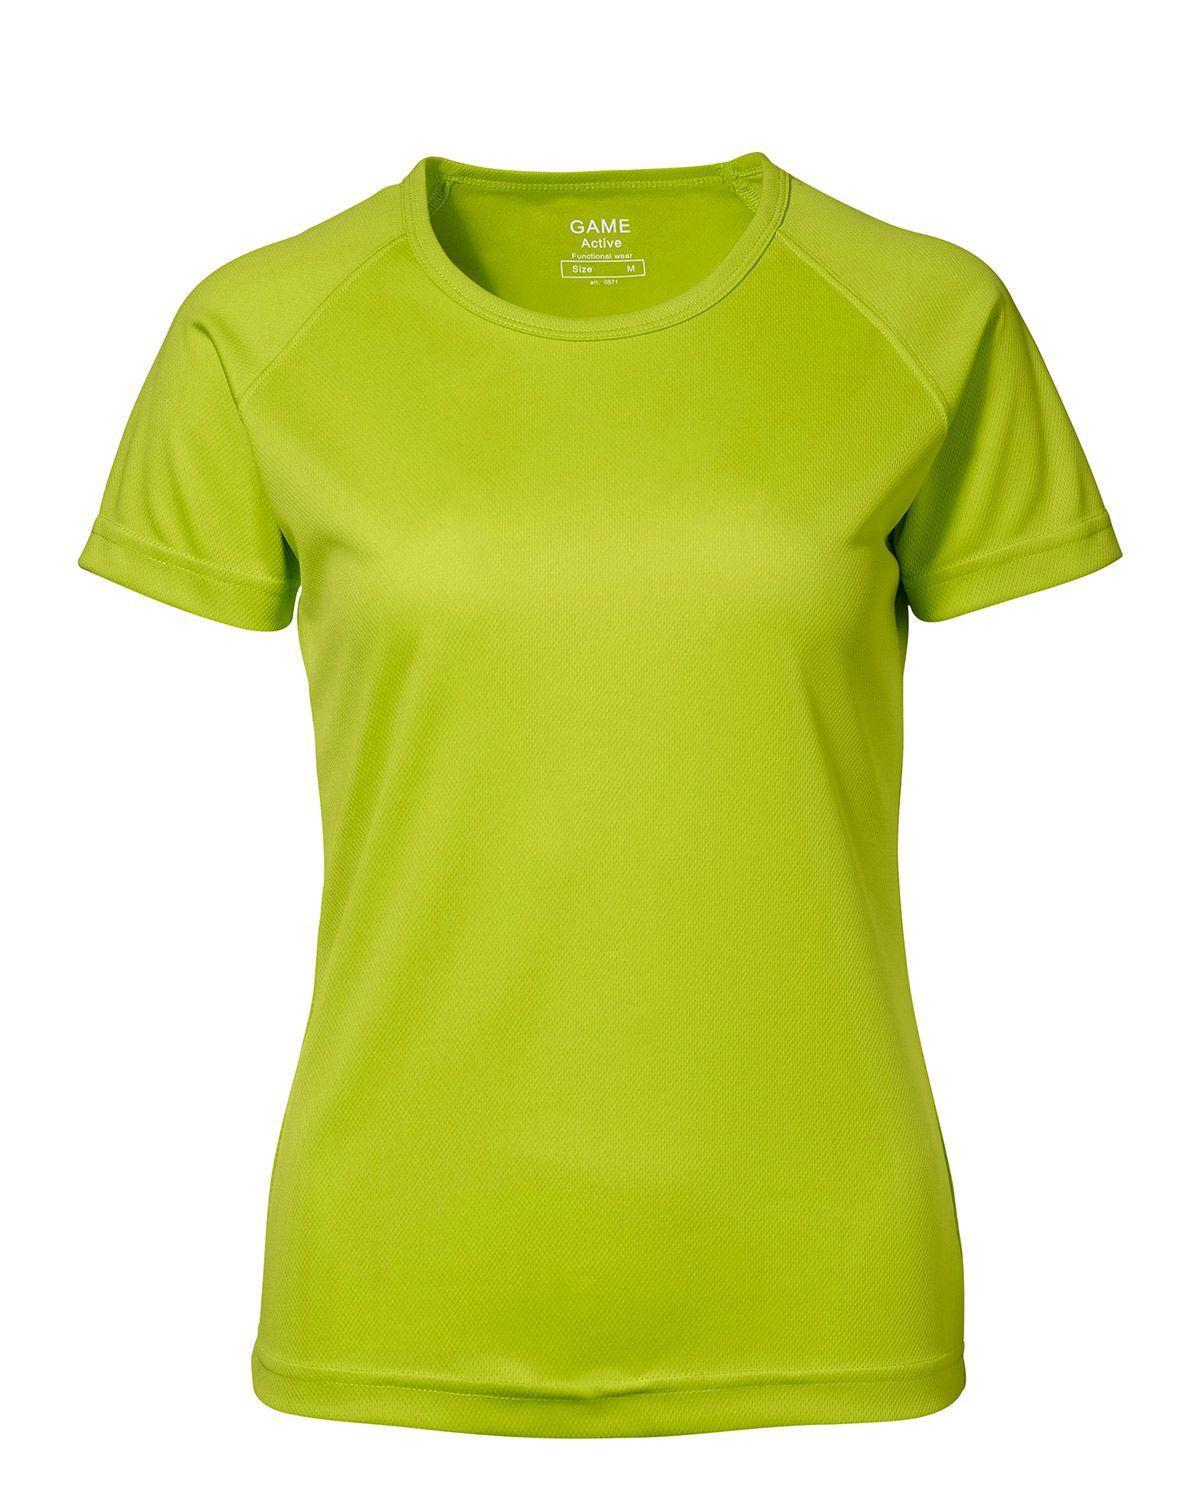 ID GAME Active T-shirt för Kvinnor (Lime, XL)